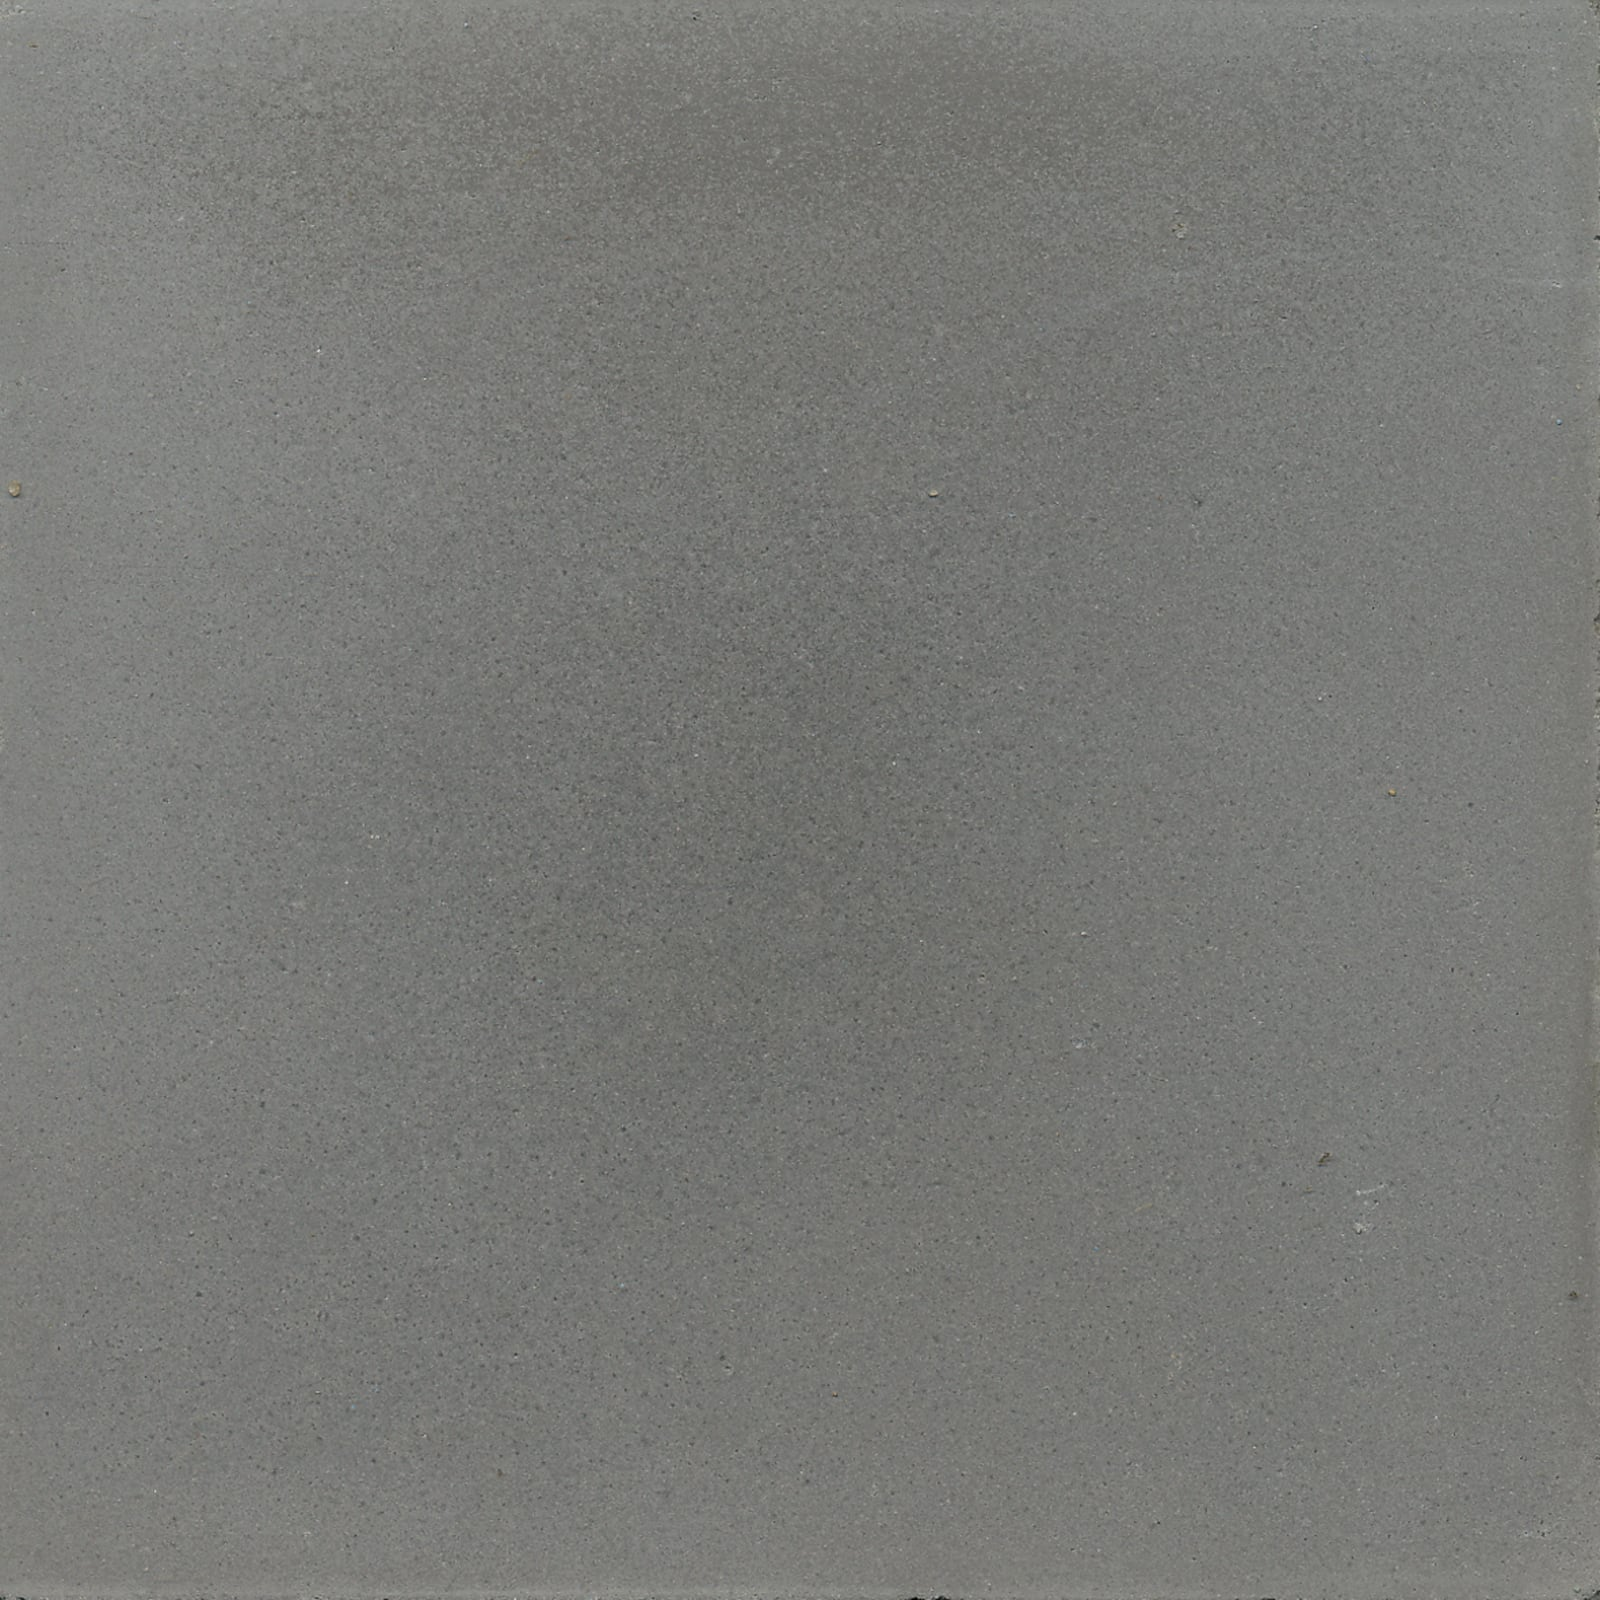 zementfliesen-terrazzofliesen-kreidefarbe-terrazzo-fugenlos-viaplatten-62   62